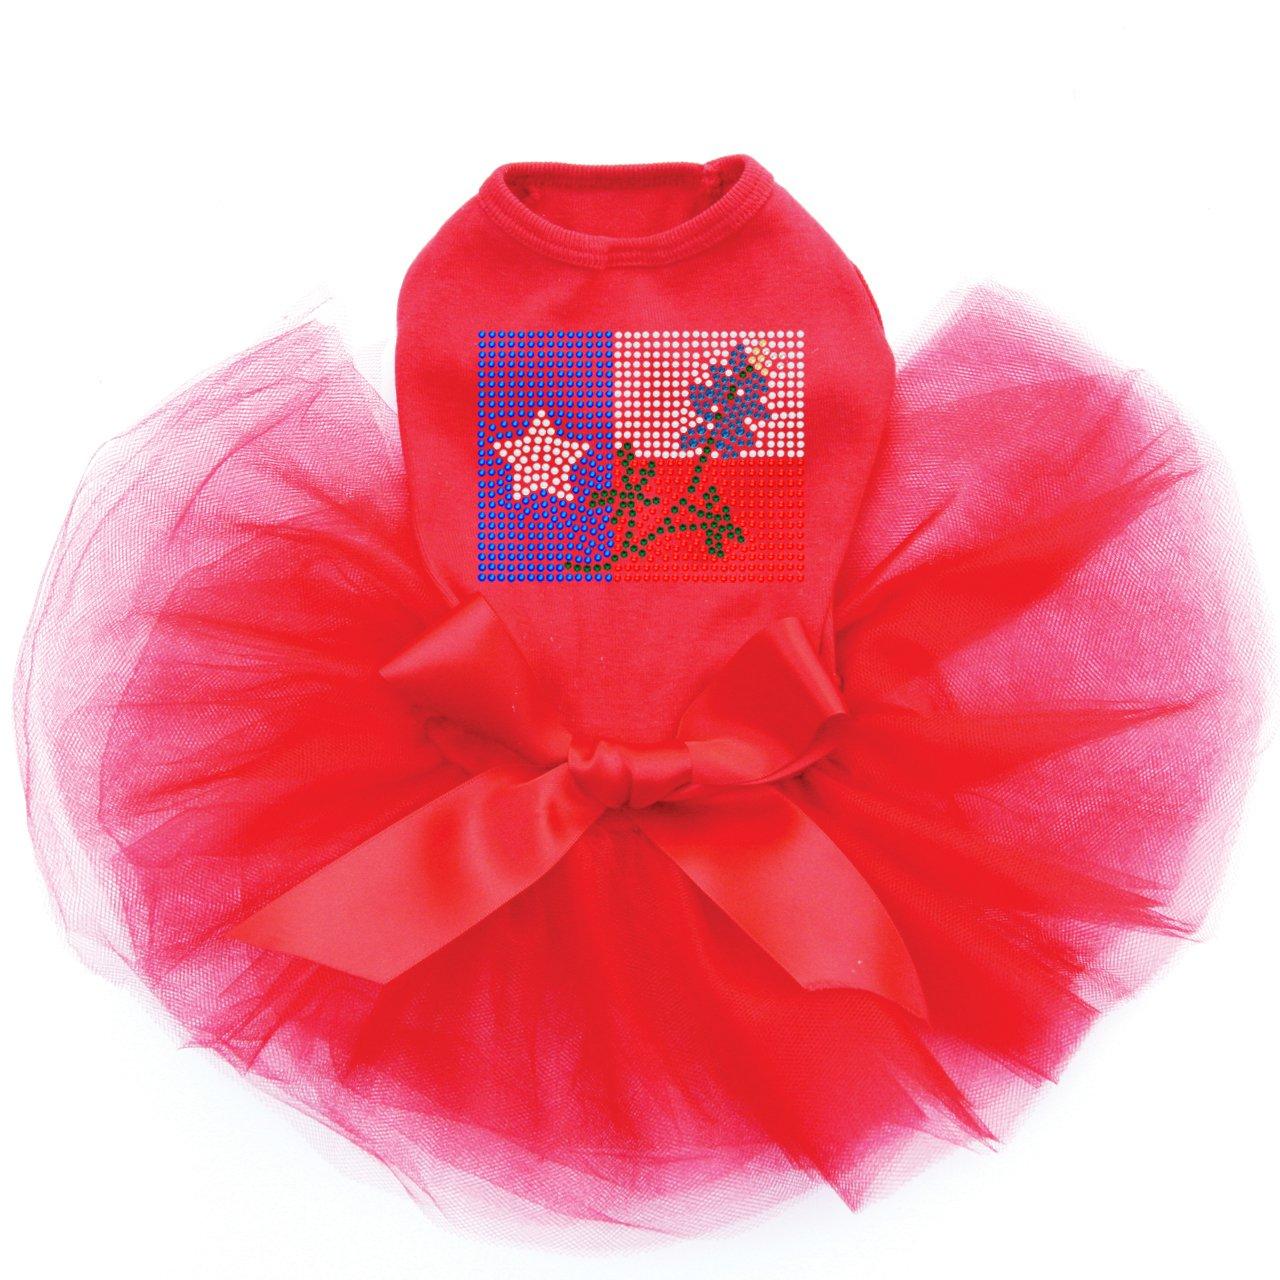 Texas Flag with Bluebonnet - Bling Rhinestone Dog Tutu Dress, 4XL Red by Dog in the Closet